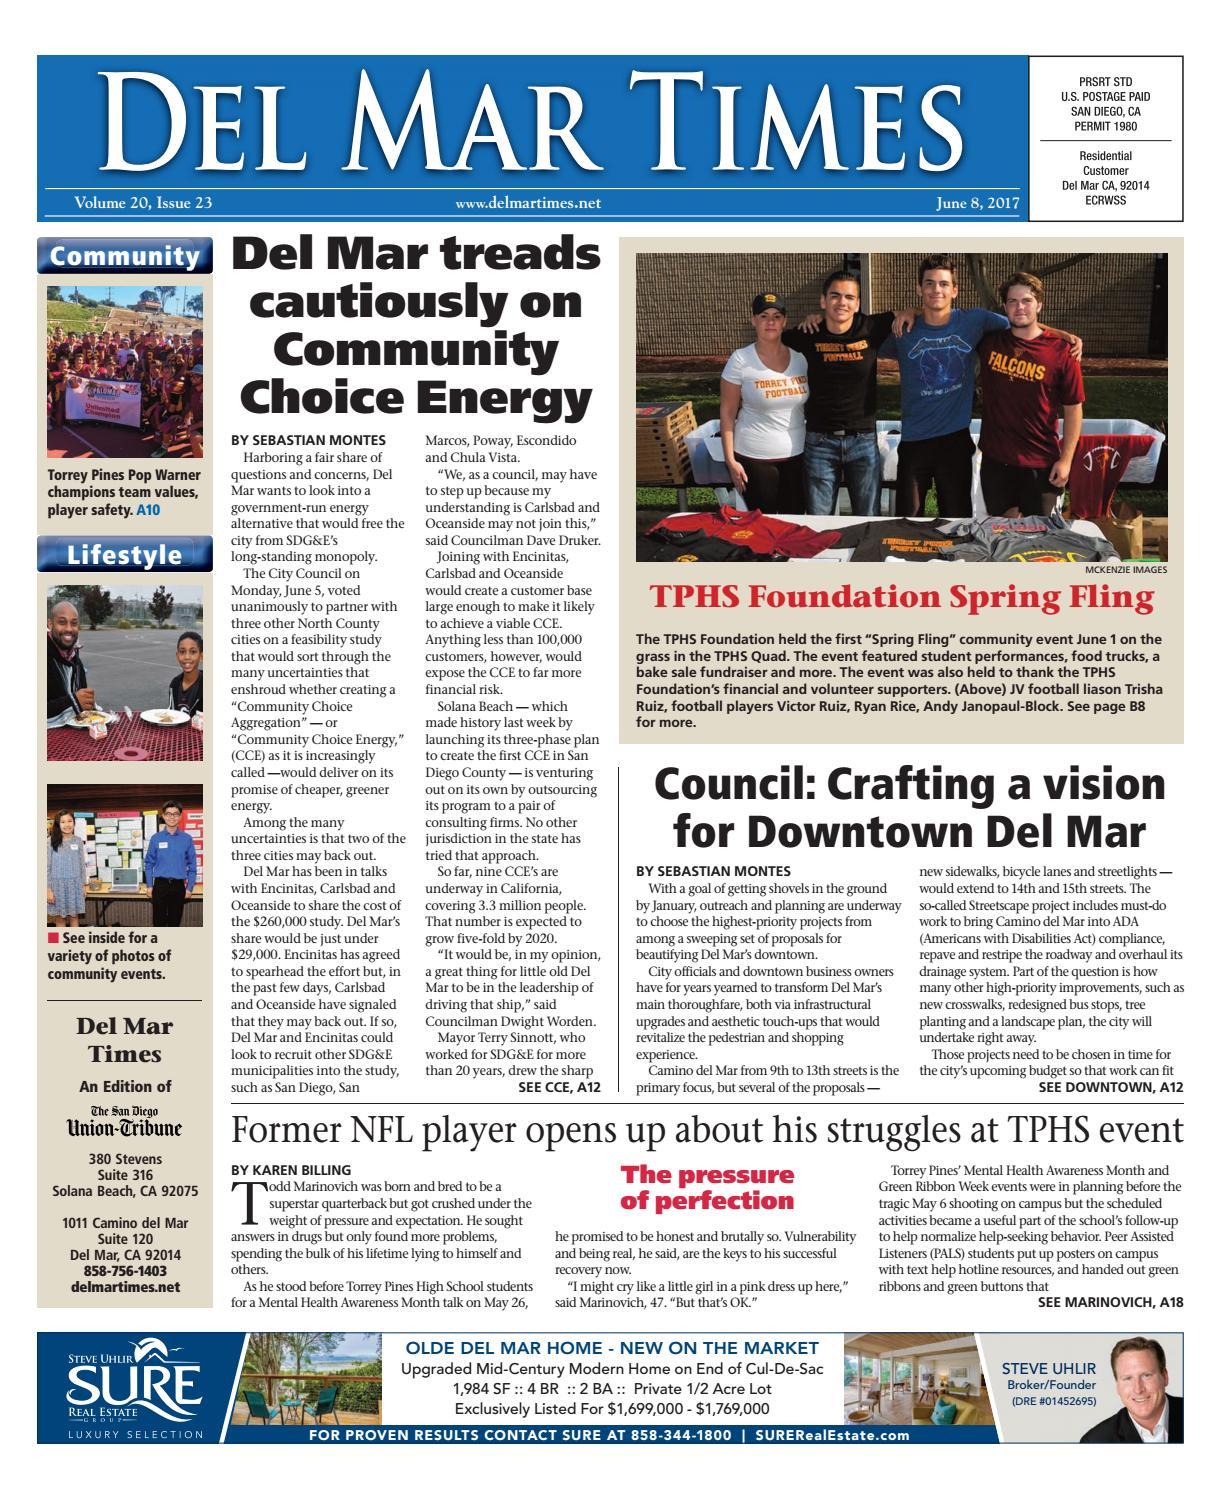 Del Mar Times 06 08 17 by MainStreet Media - issuu